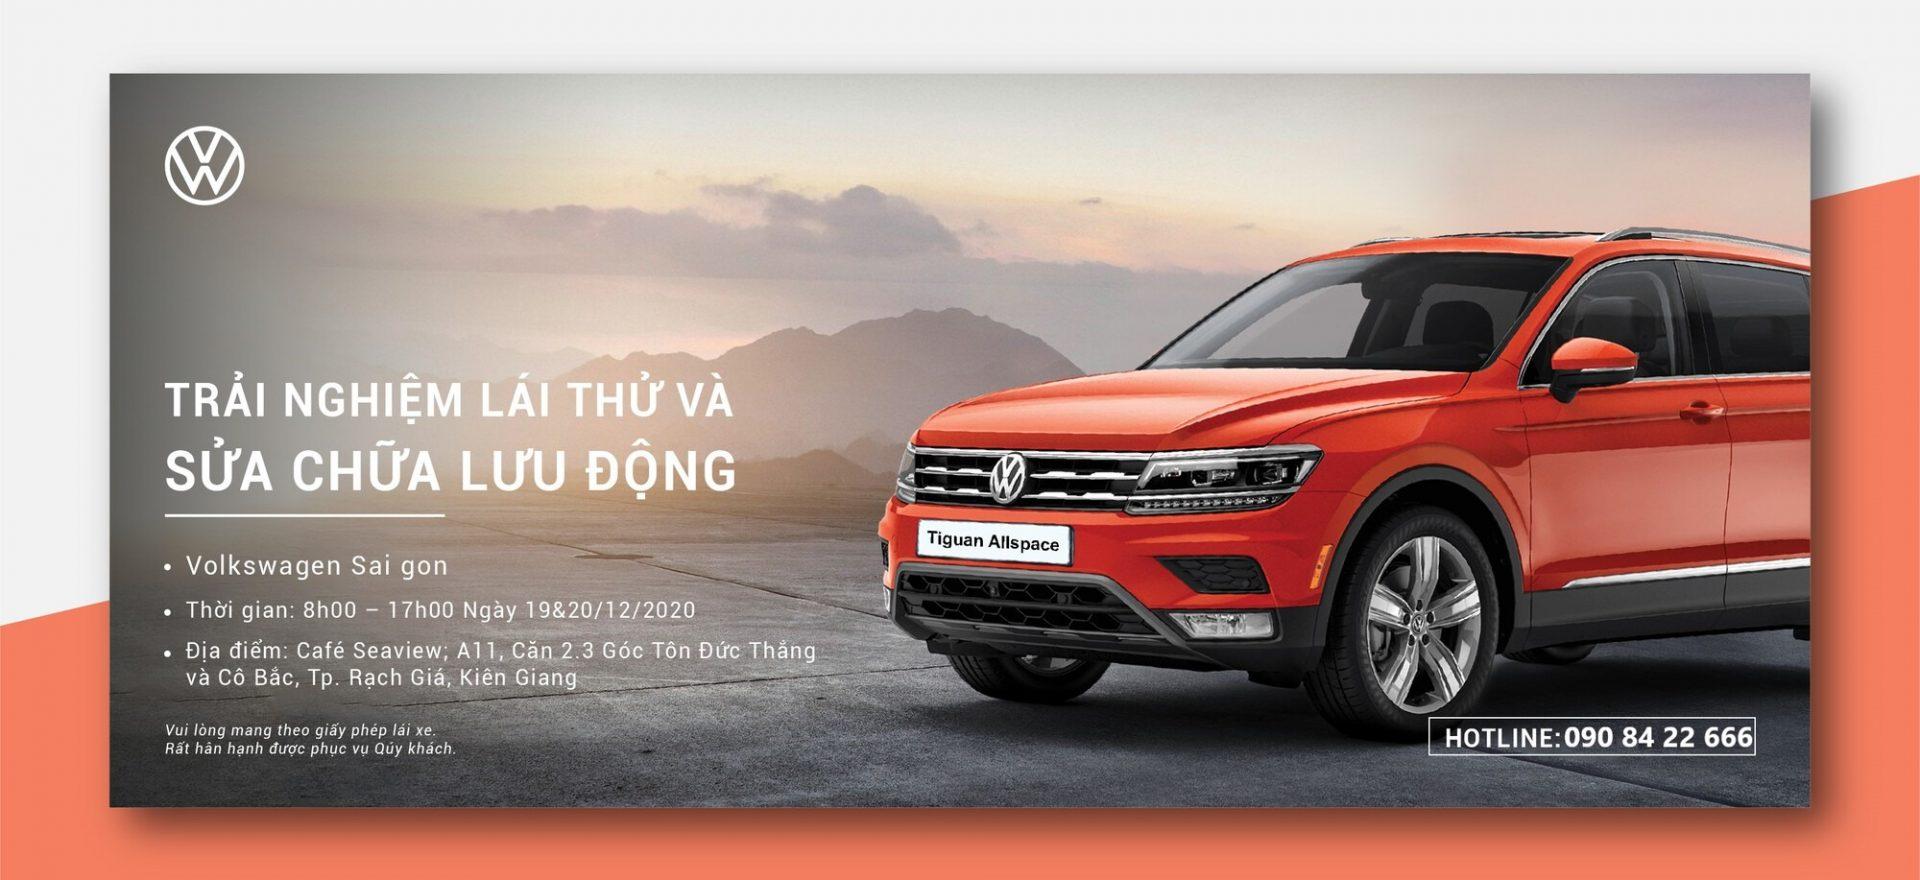 lai-thu-xe-volkswagen-tai-rach-gia- Volkswagen Sai Gon